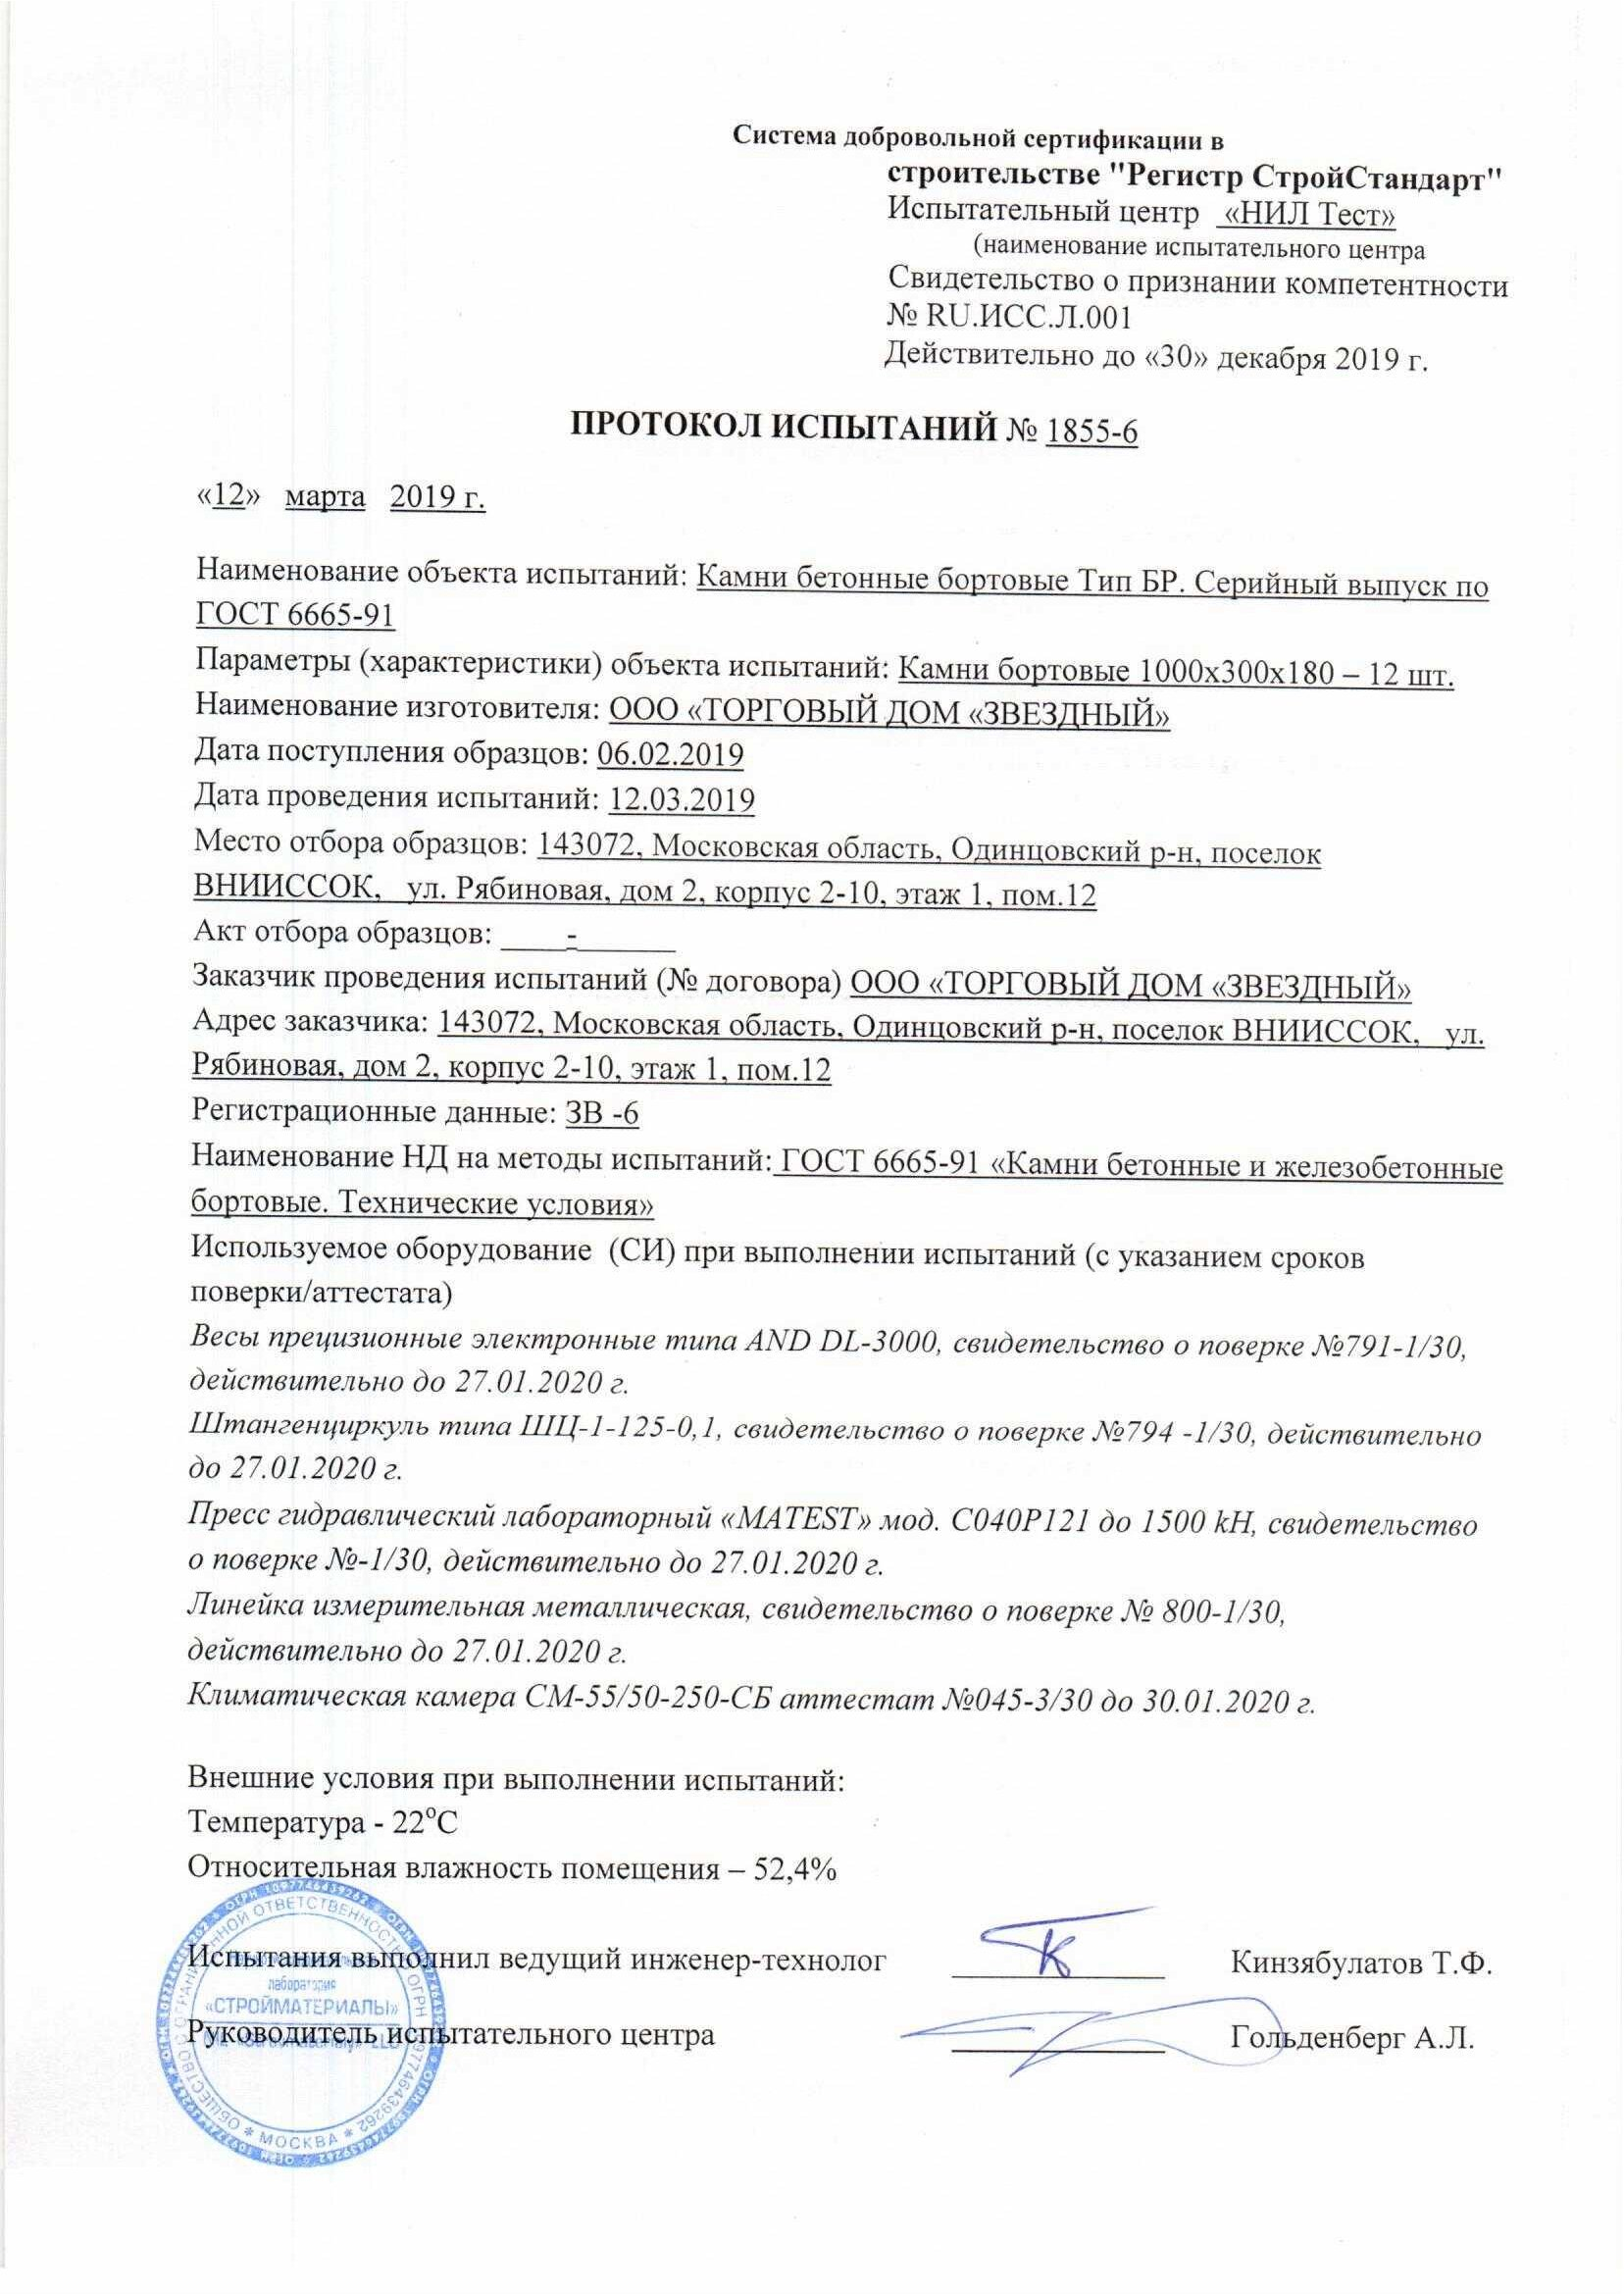 Протокол_испытаний_на_бордюр_100.30.18_18.jpg